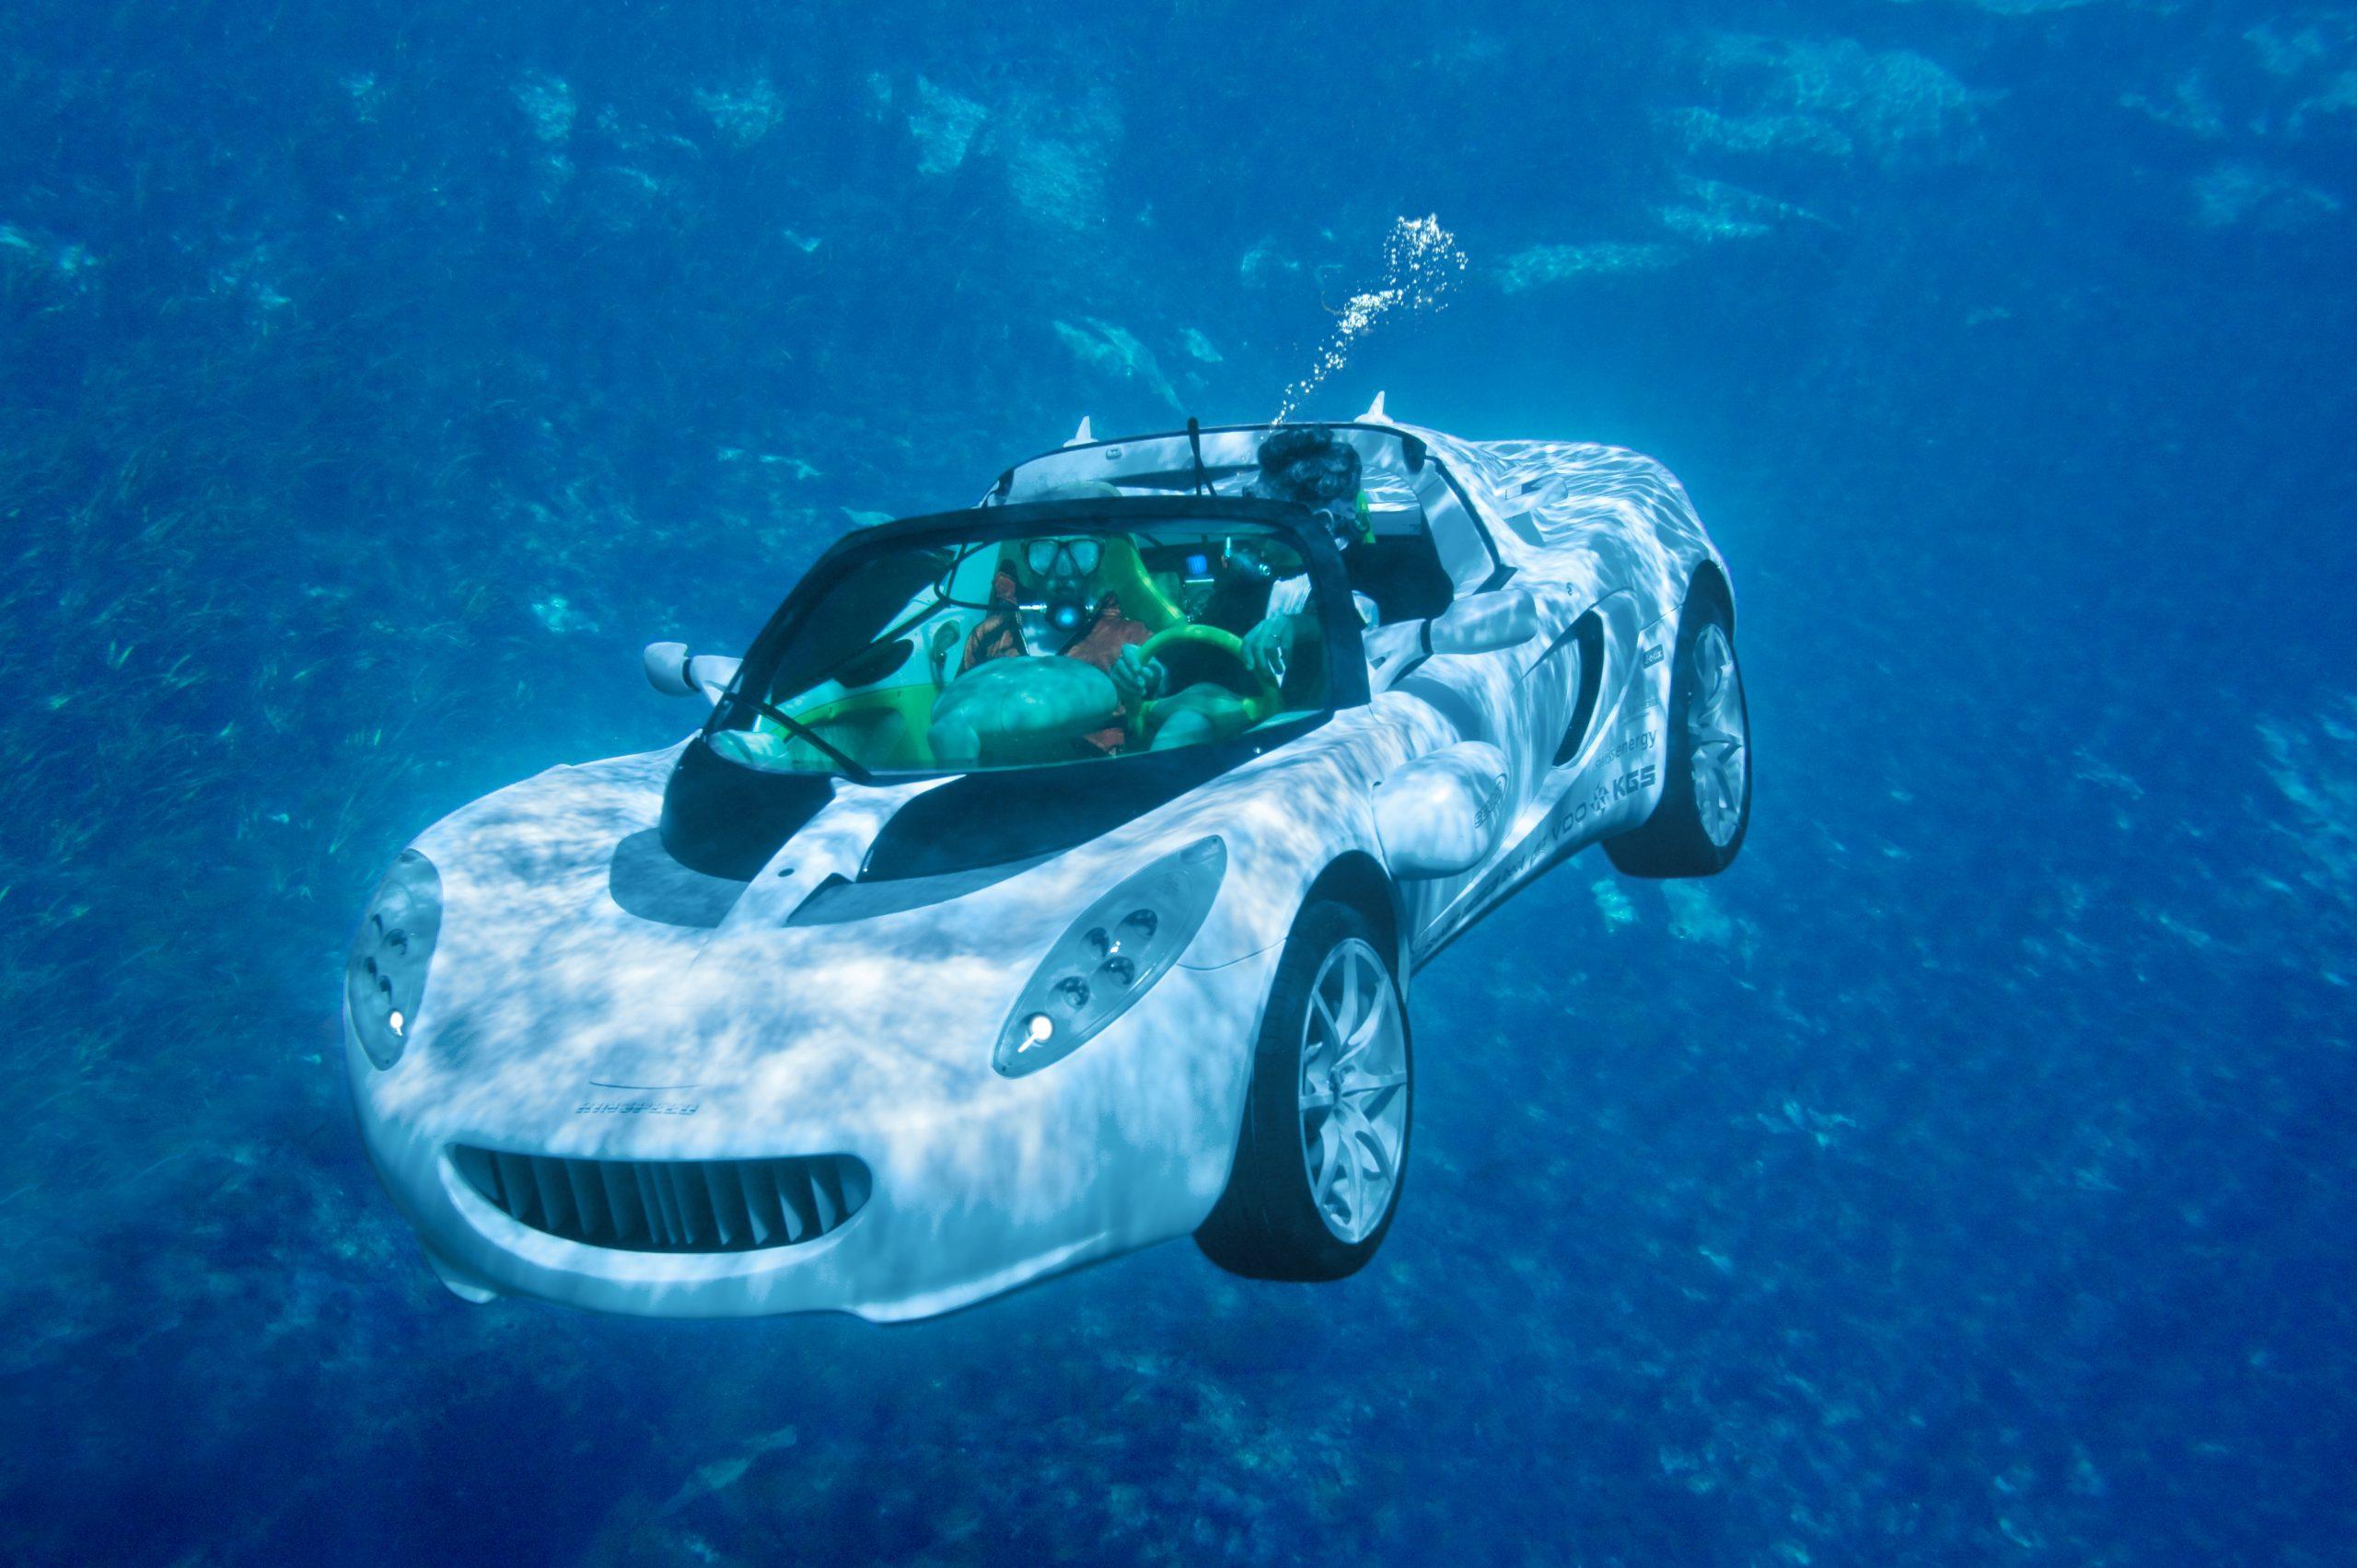 Rinspeed Squba underwater